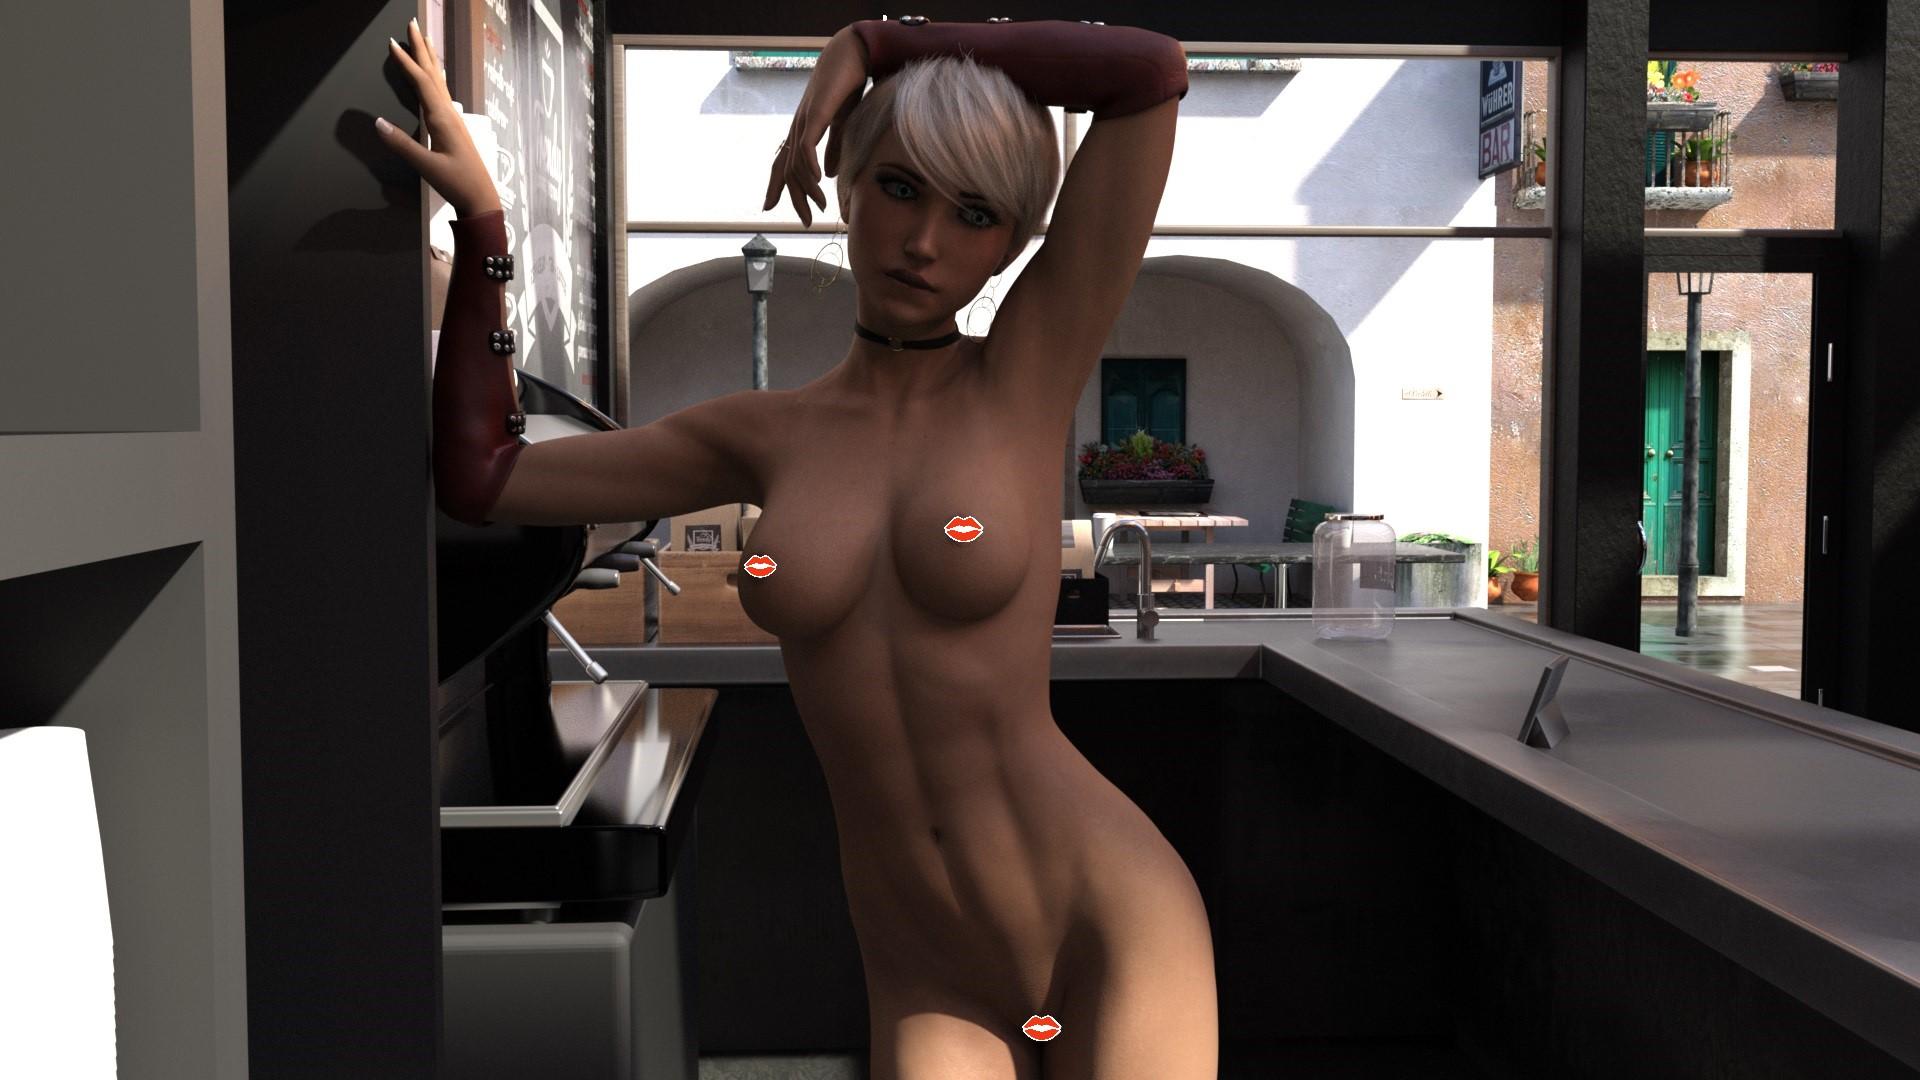 https://i5.imageban.ru/out/2021/07/03/aaccc7473bafaaef2d9eb62d9f2b9072.jpg